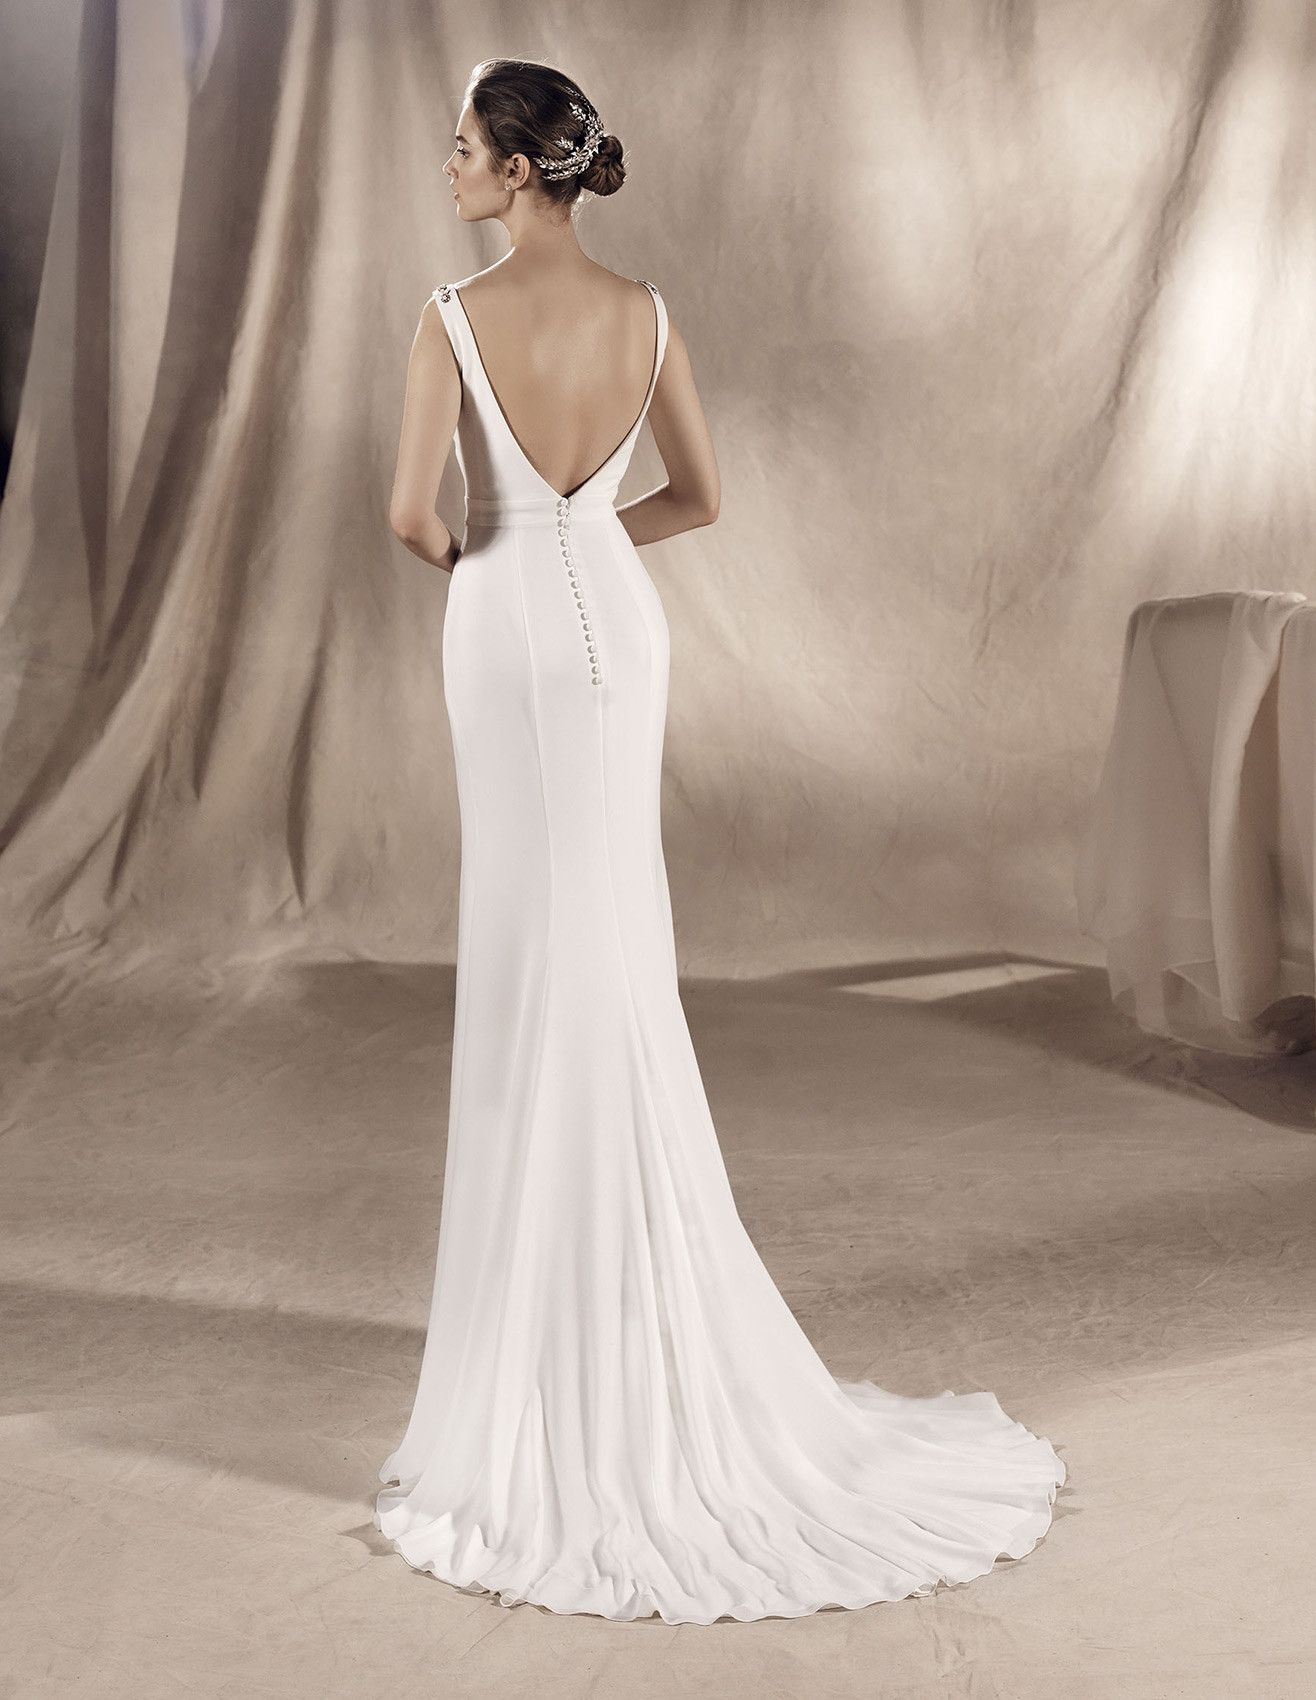 Suria Abito Sposa Scollatura A Punta Wedding Dresses Dresses Pronovias Wedding Dress [ 1700 x 1316 Pixel ]